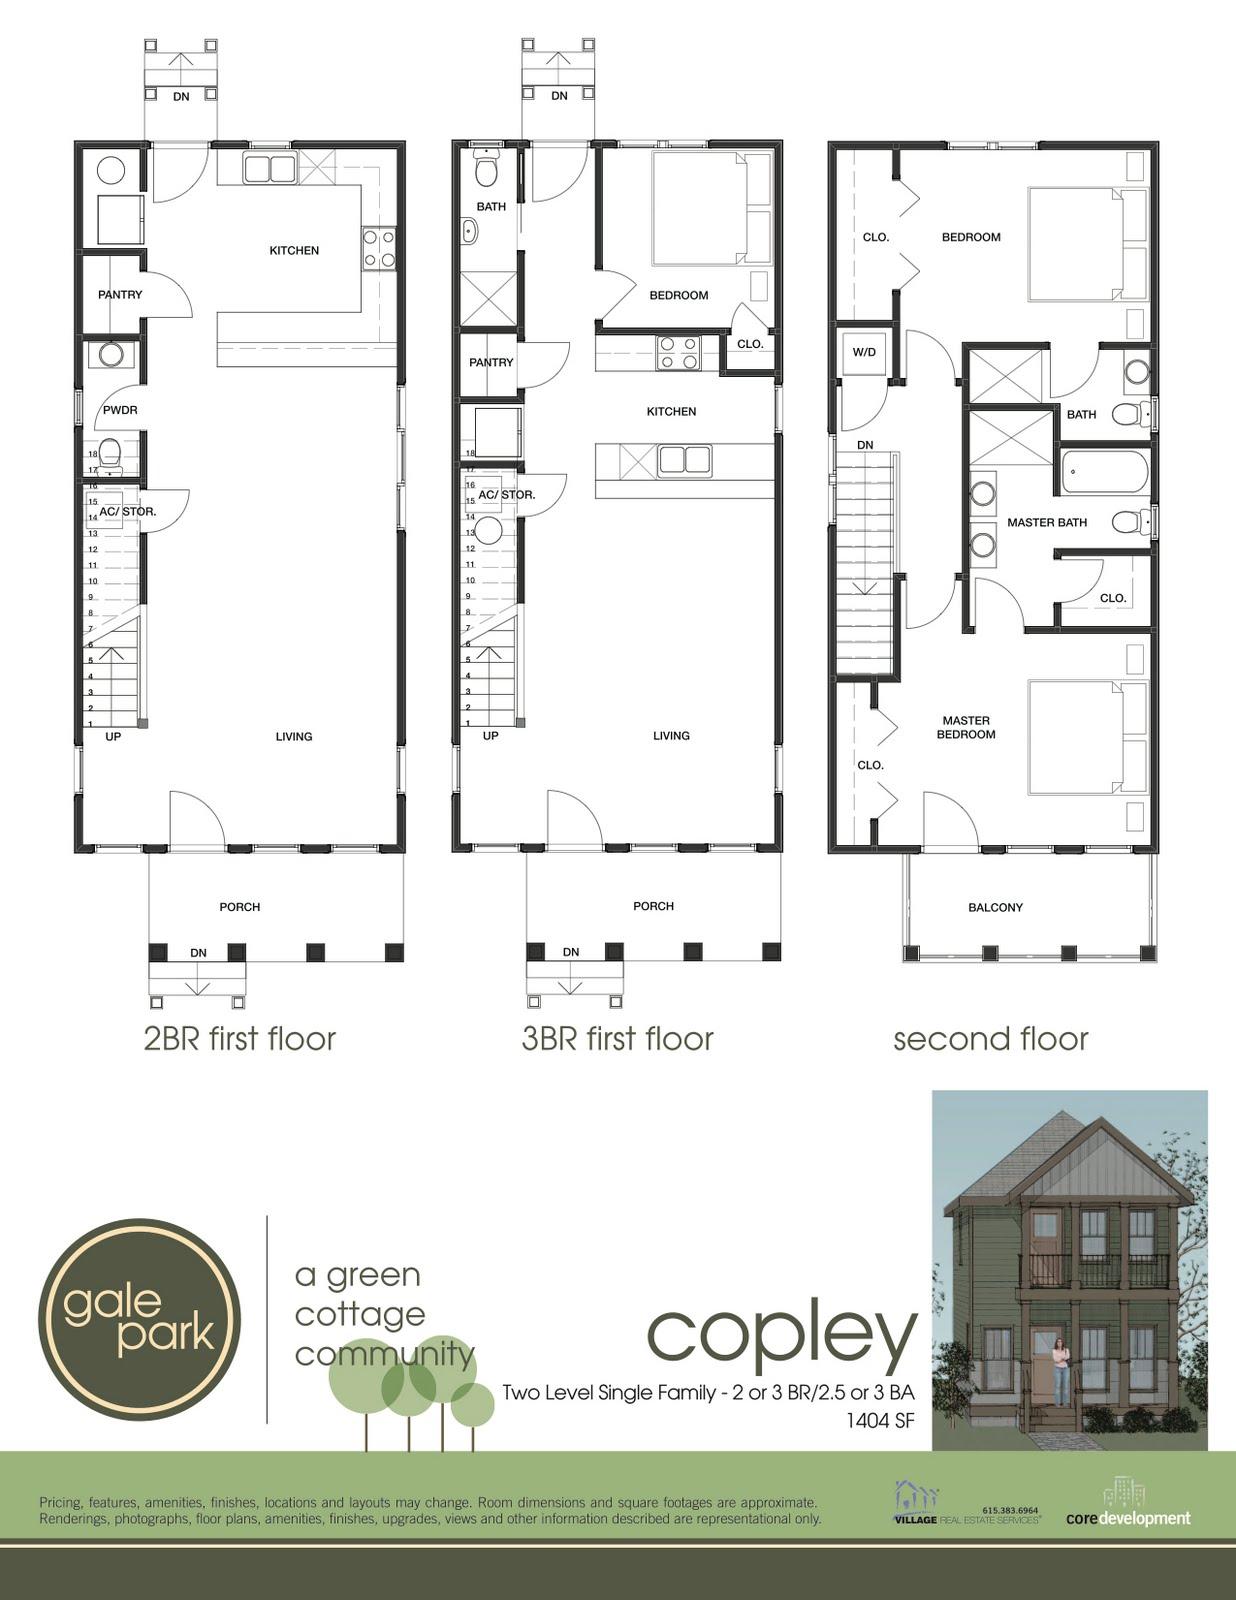 Gale Park Homes Nashville Featured Floor Plan Copley